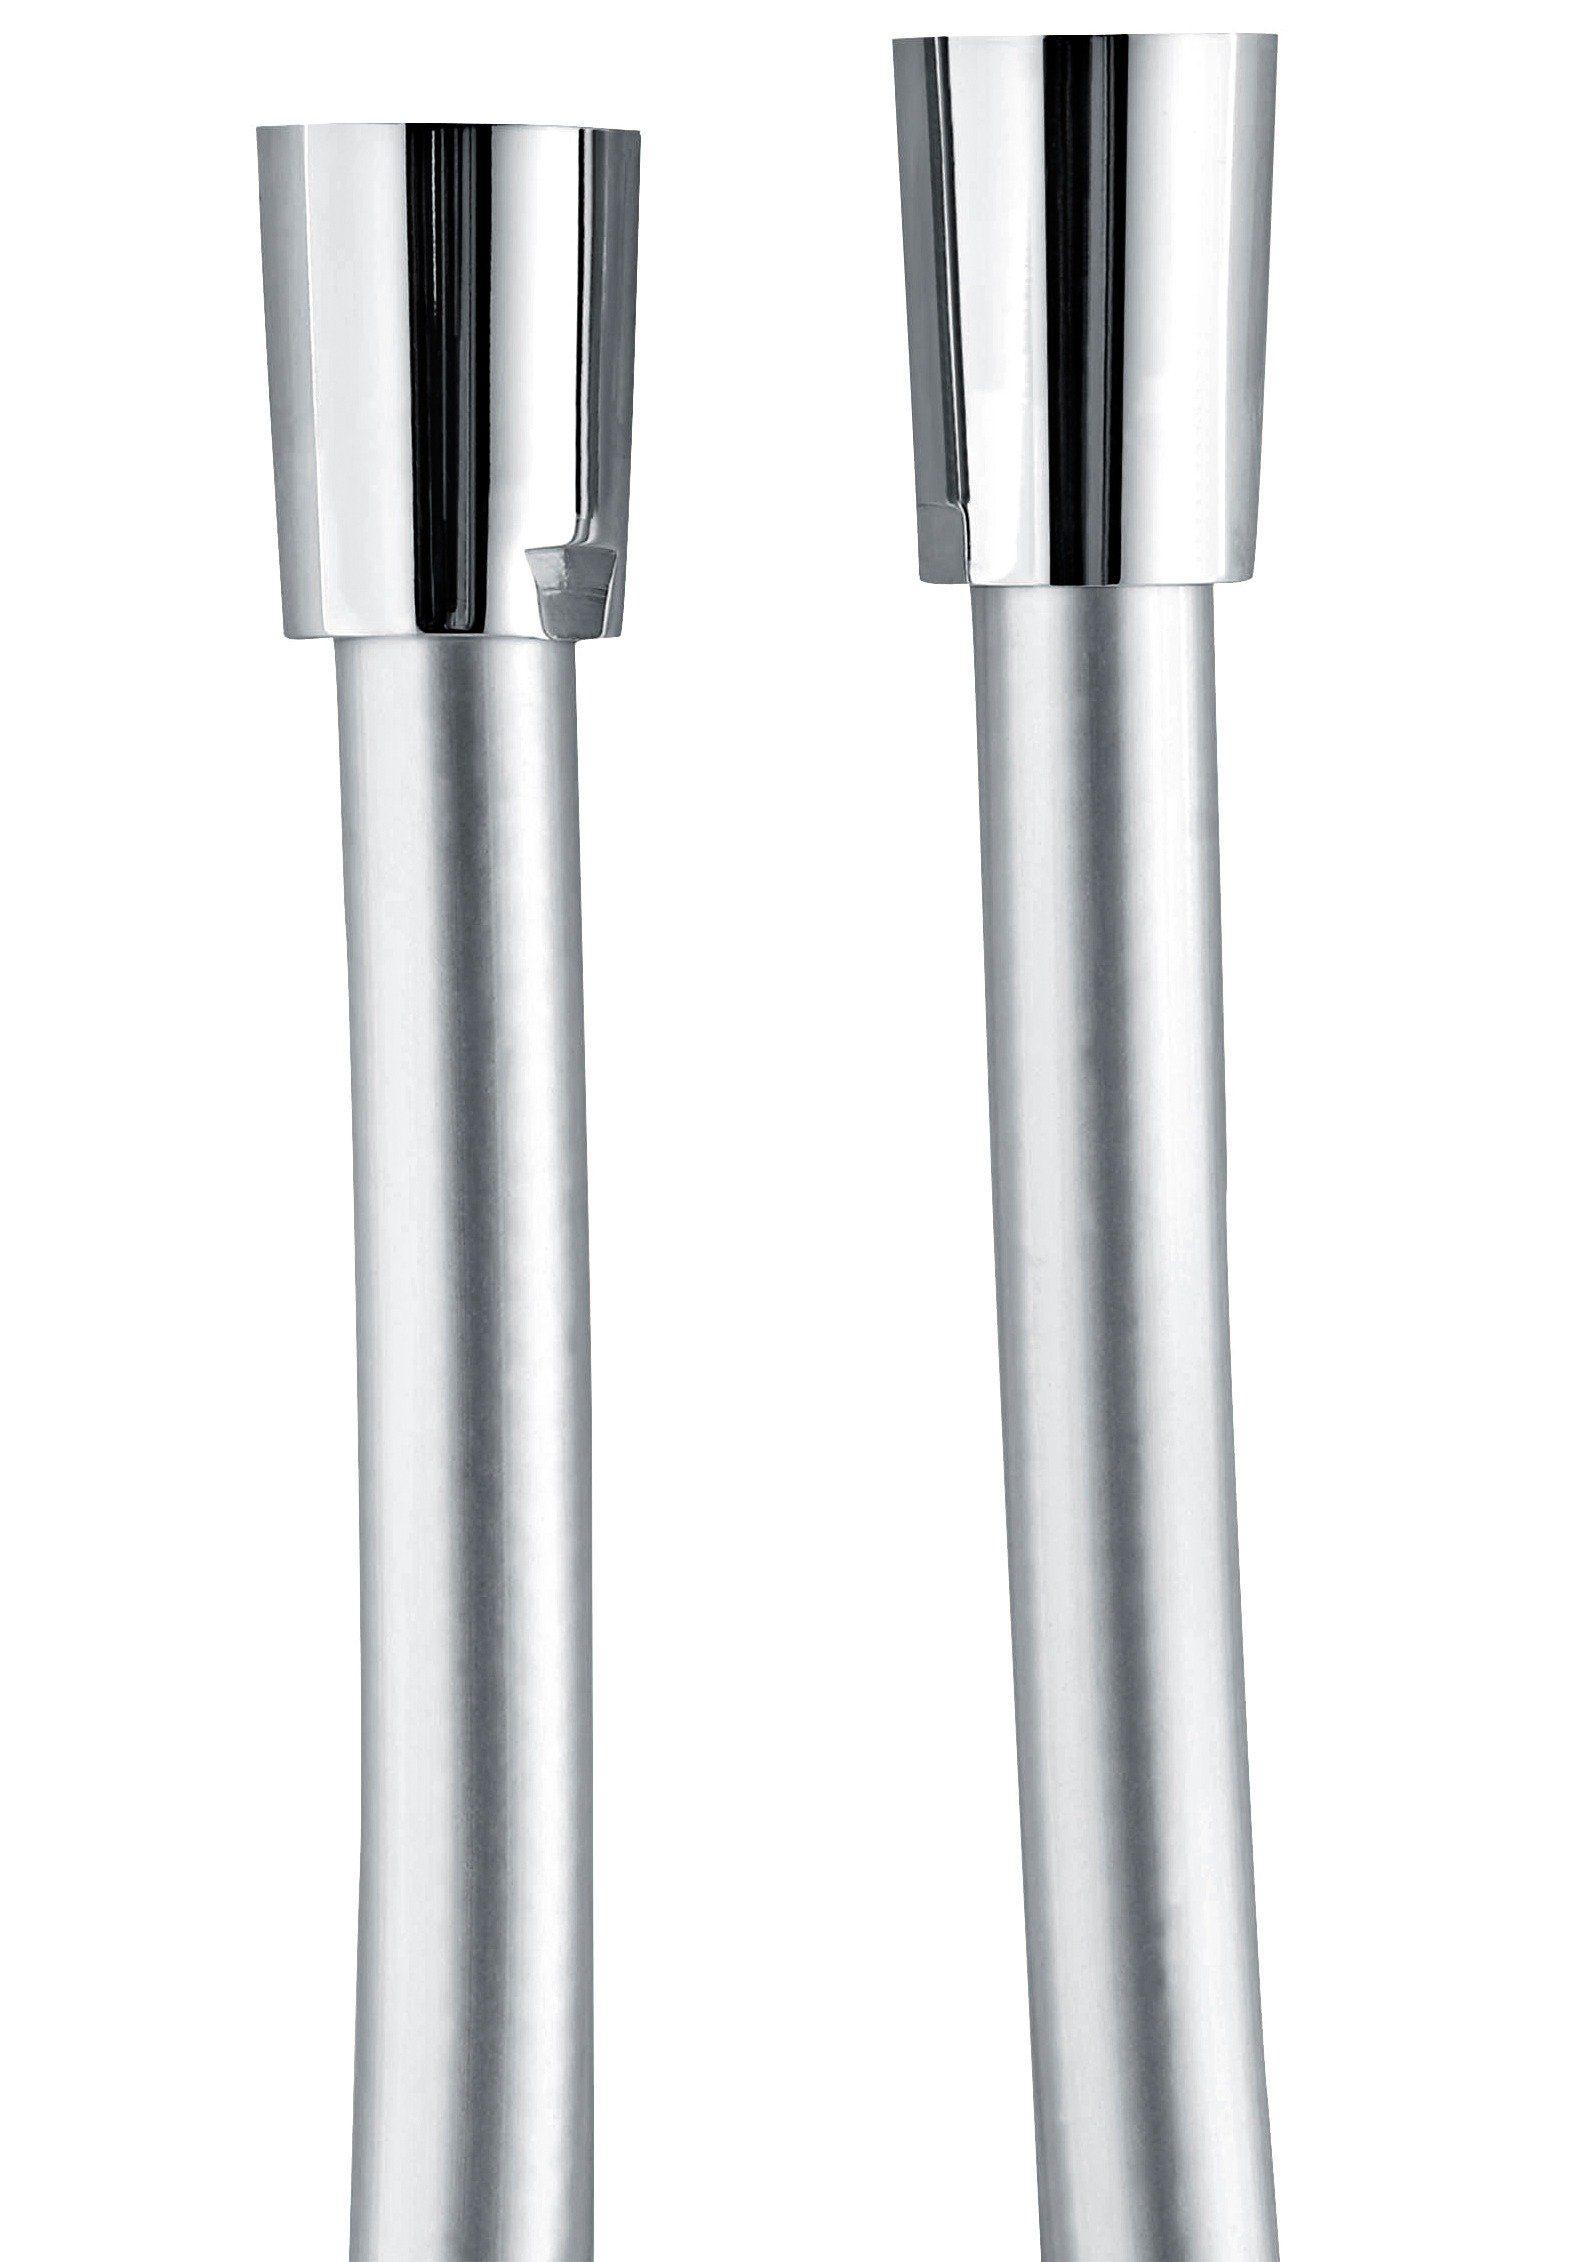 Schulte Duschbrausenschlauch »Silber«, 125 cm